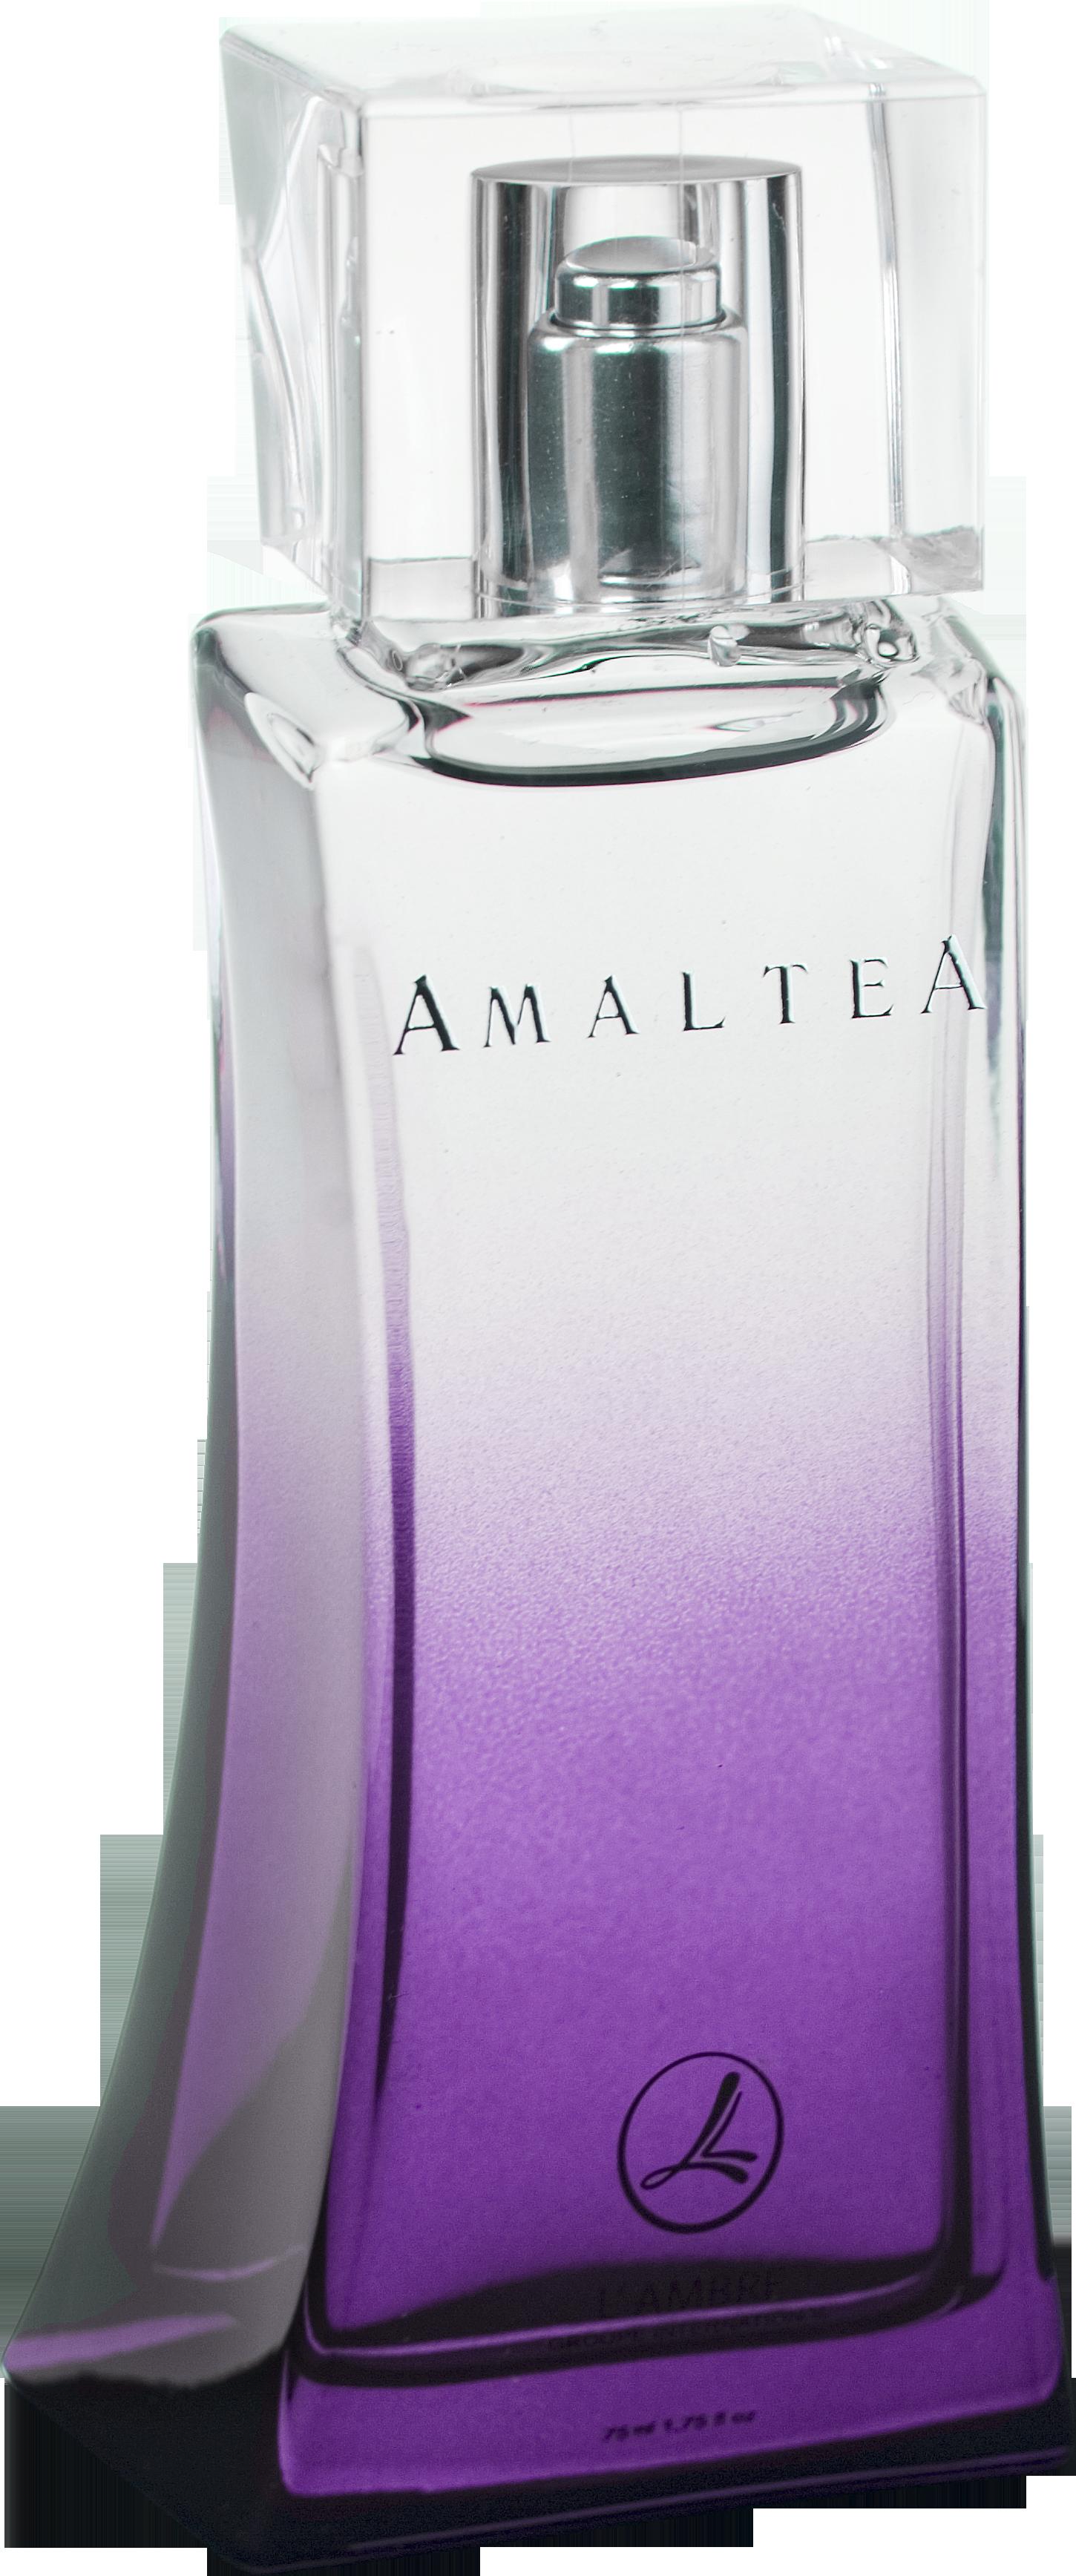 Perfume clipart transparent. Png image